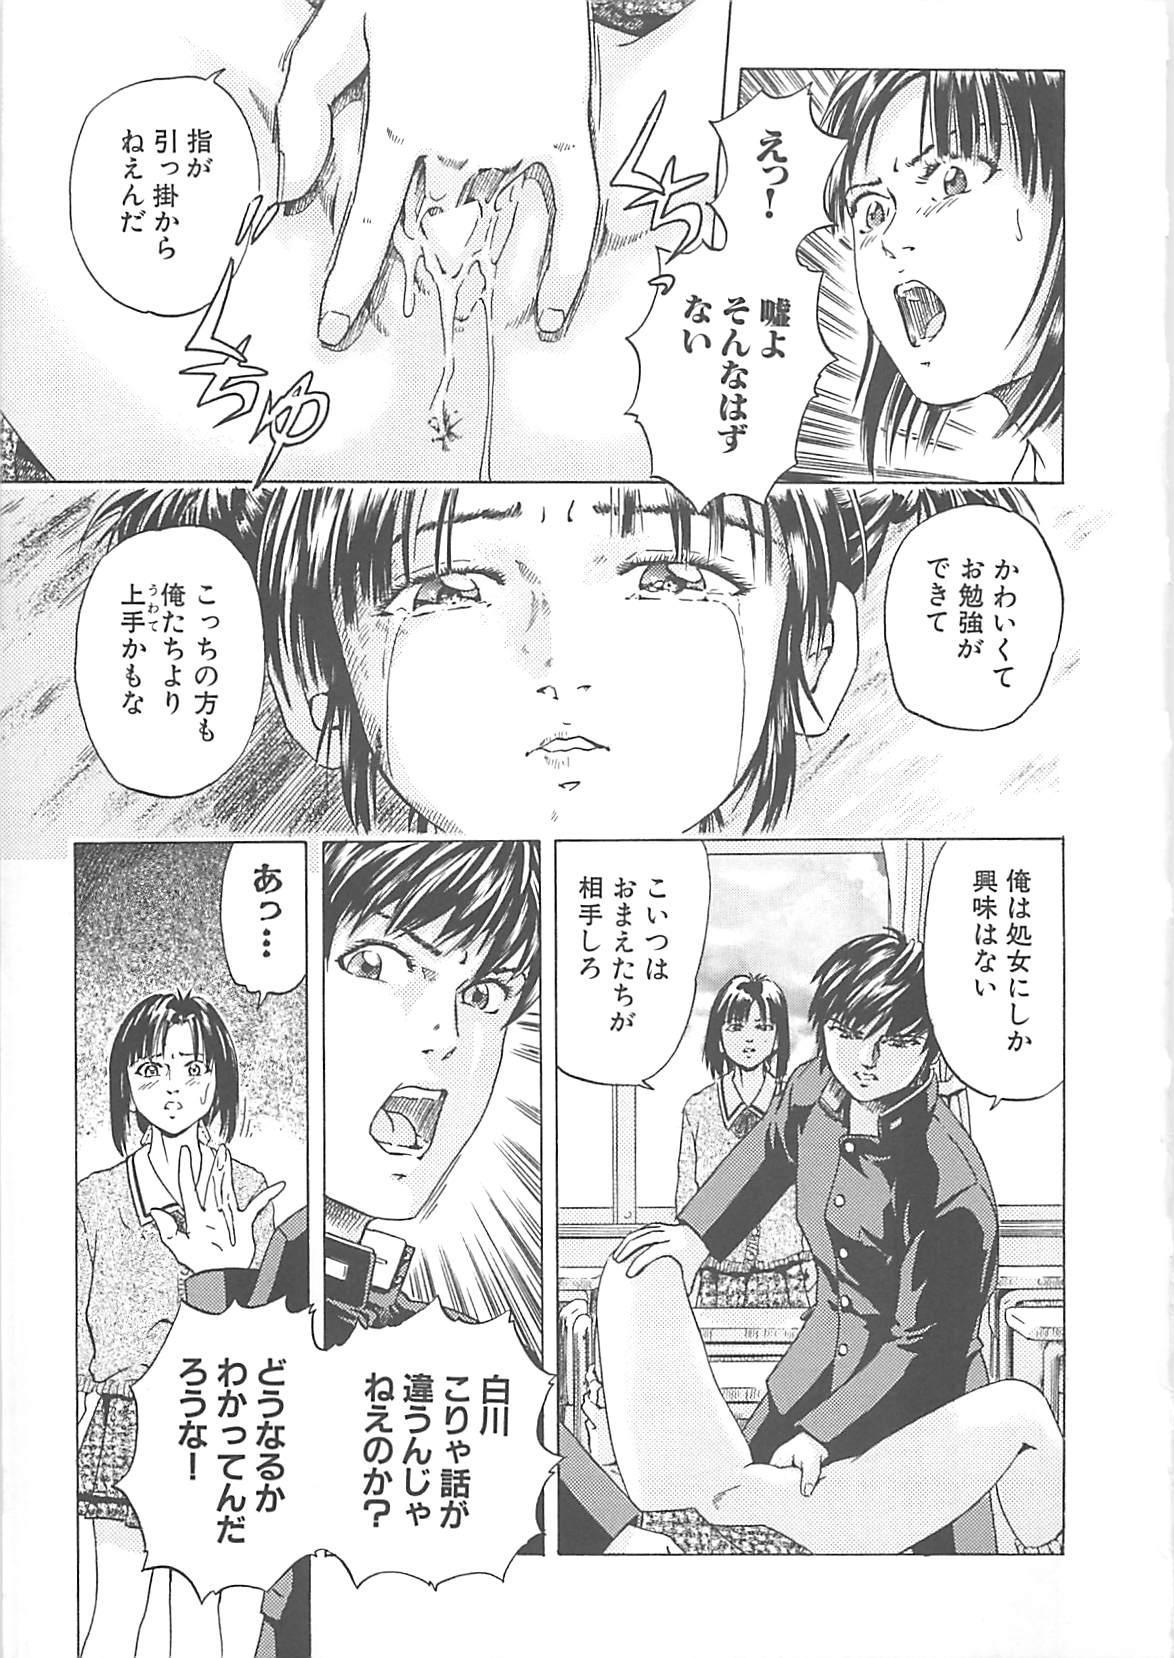 Kanin Kyoushitsu - Adultery Classroom 105